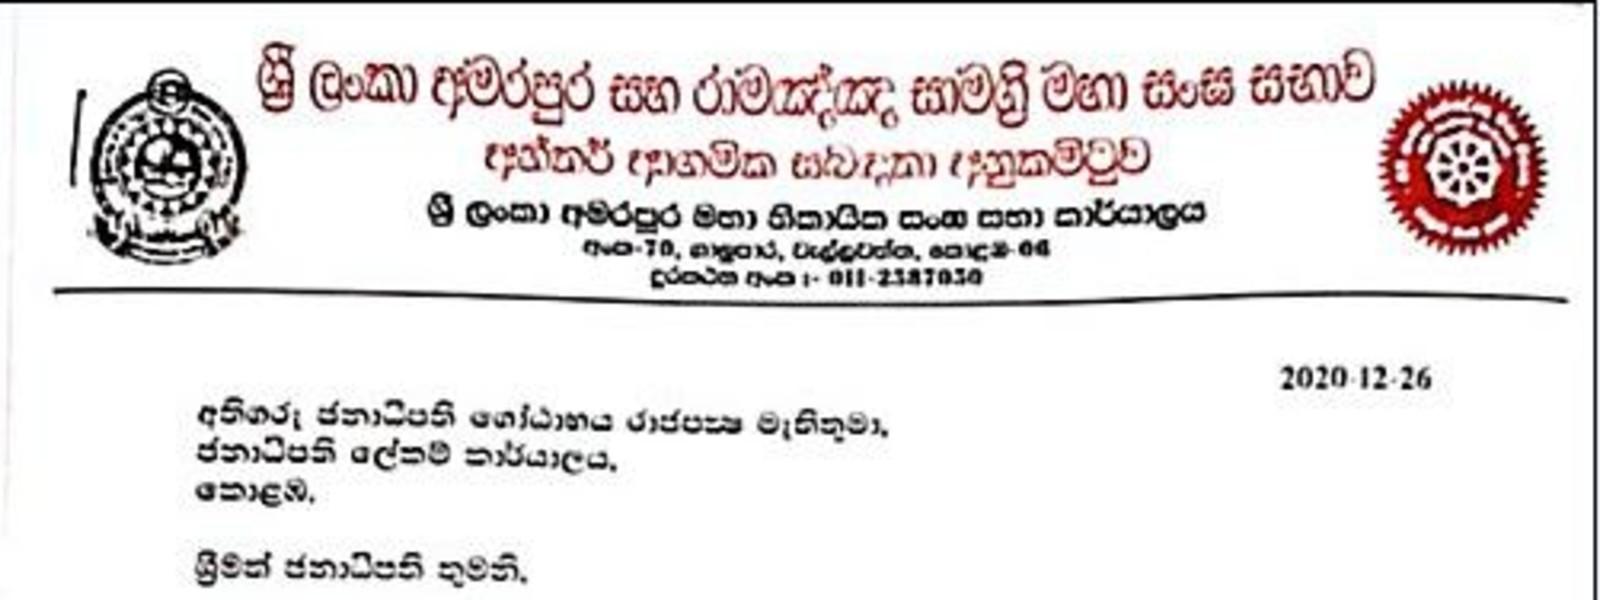 BURY COVID DEAD, SANGHA SABHA WRITES TO PRESIDENT